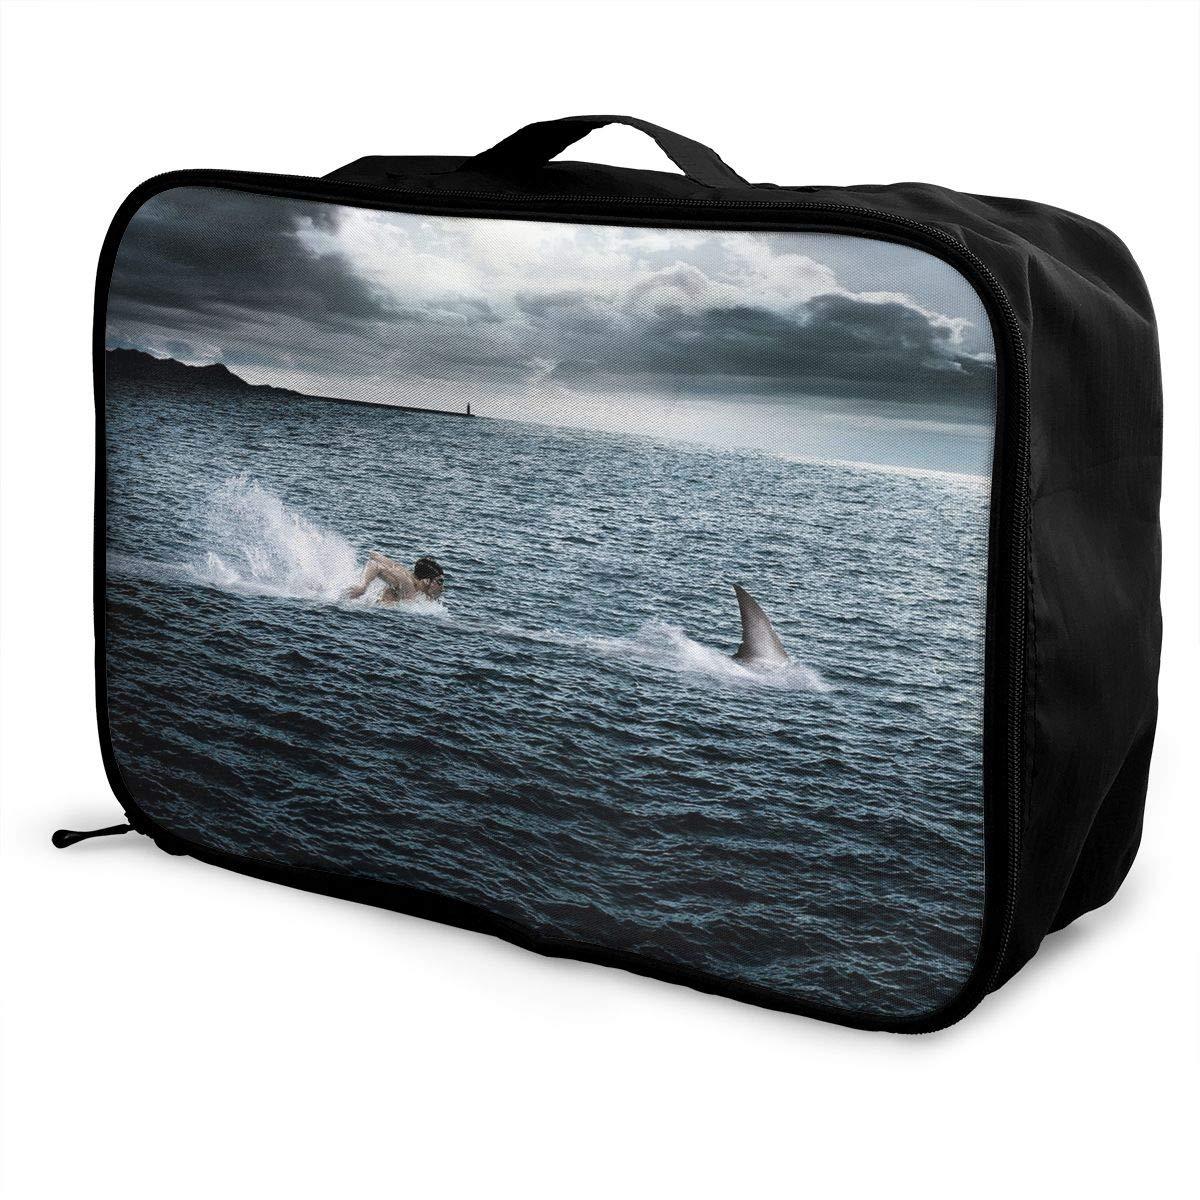 Travel Luggage Duffle Bag Lightweight Portable Handbag Piano Music Large Capacity Waterproof Foldable Storage Tote